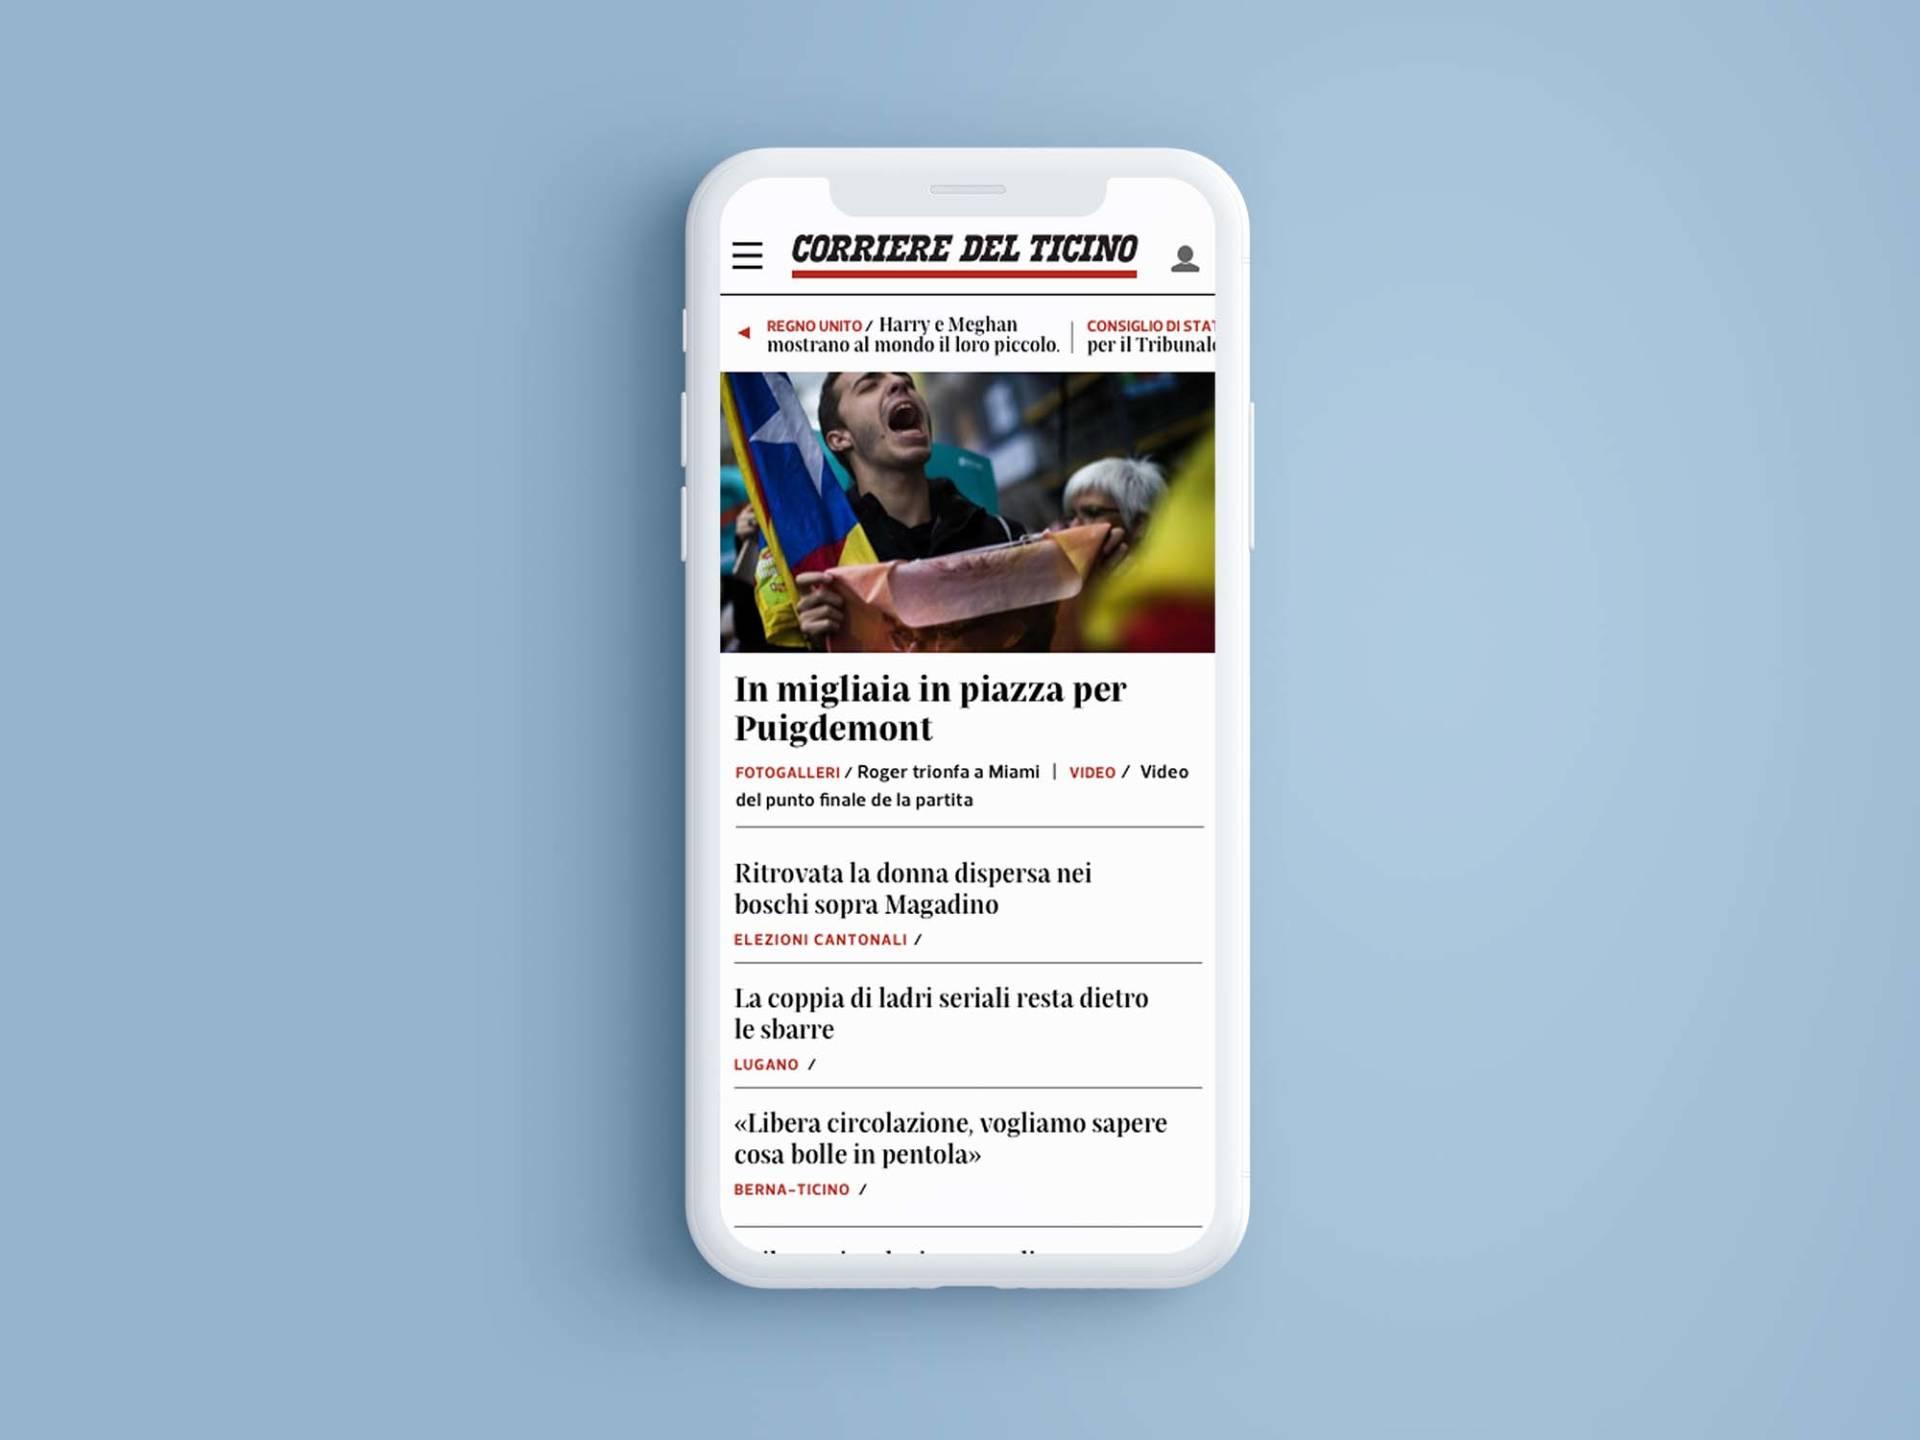 Corriere_del_Ticino web_09_Wenceslau_News_Design